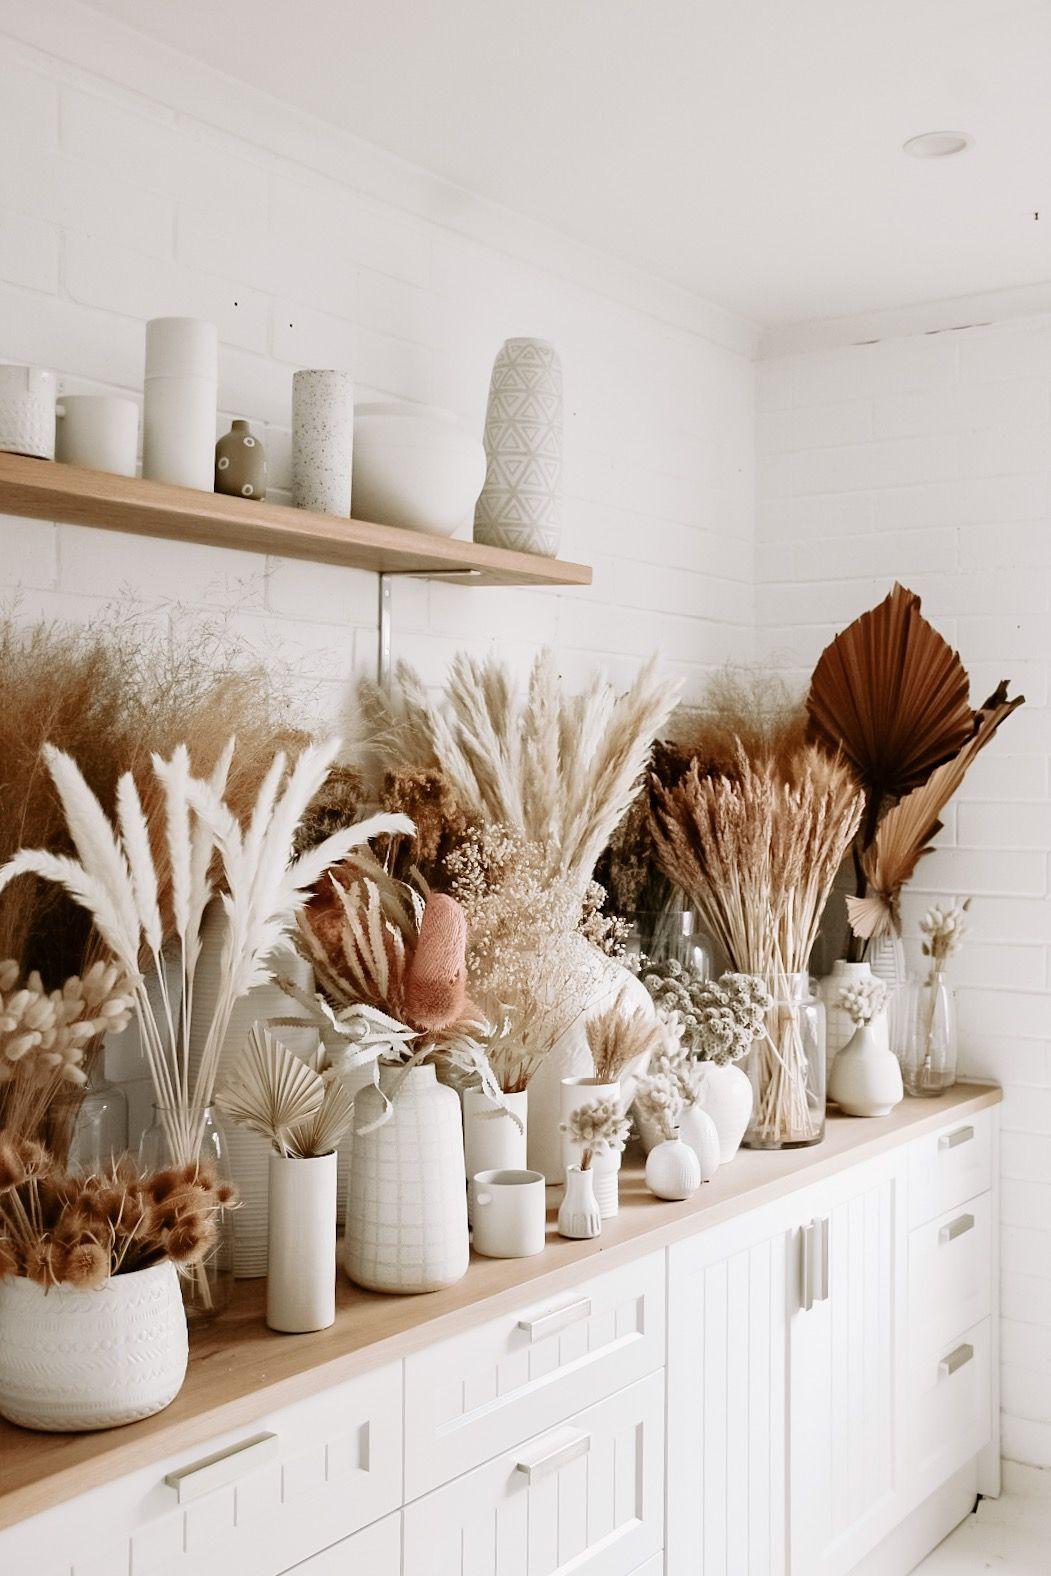 Buy Dried Flowers on the Sunshine Coast | RAW, Maroochydore